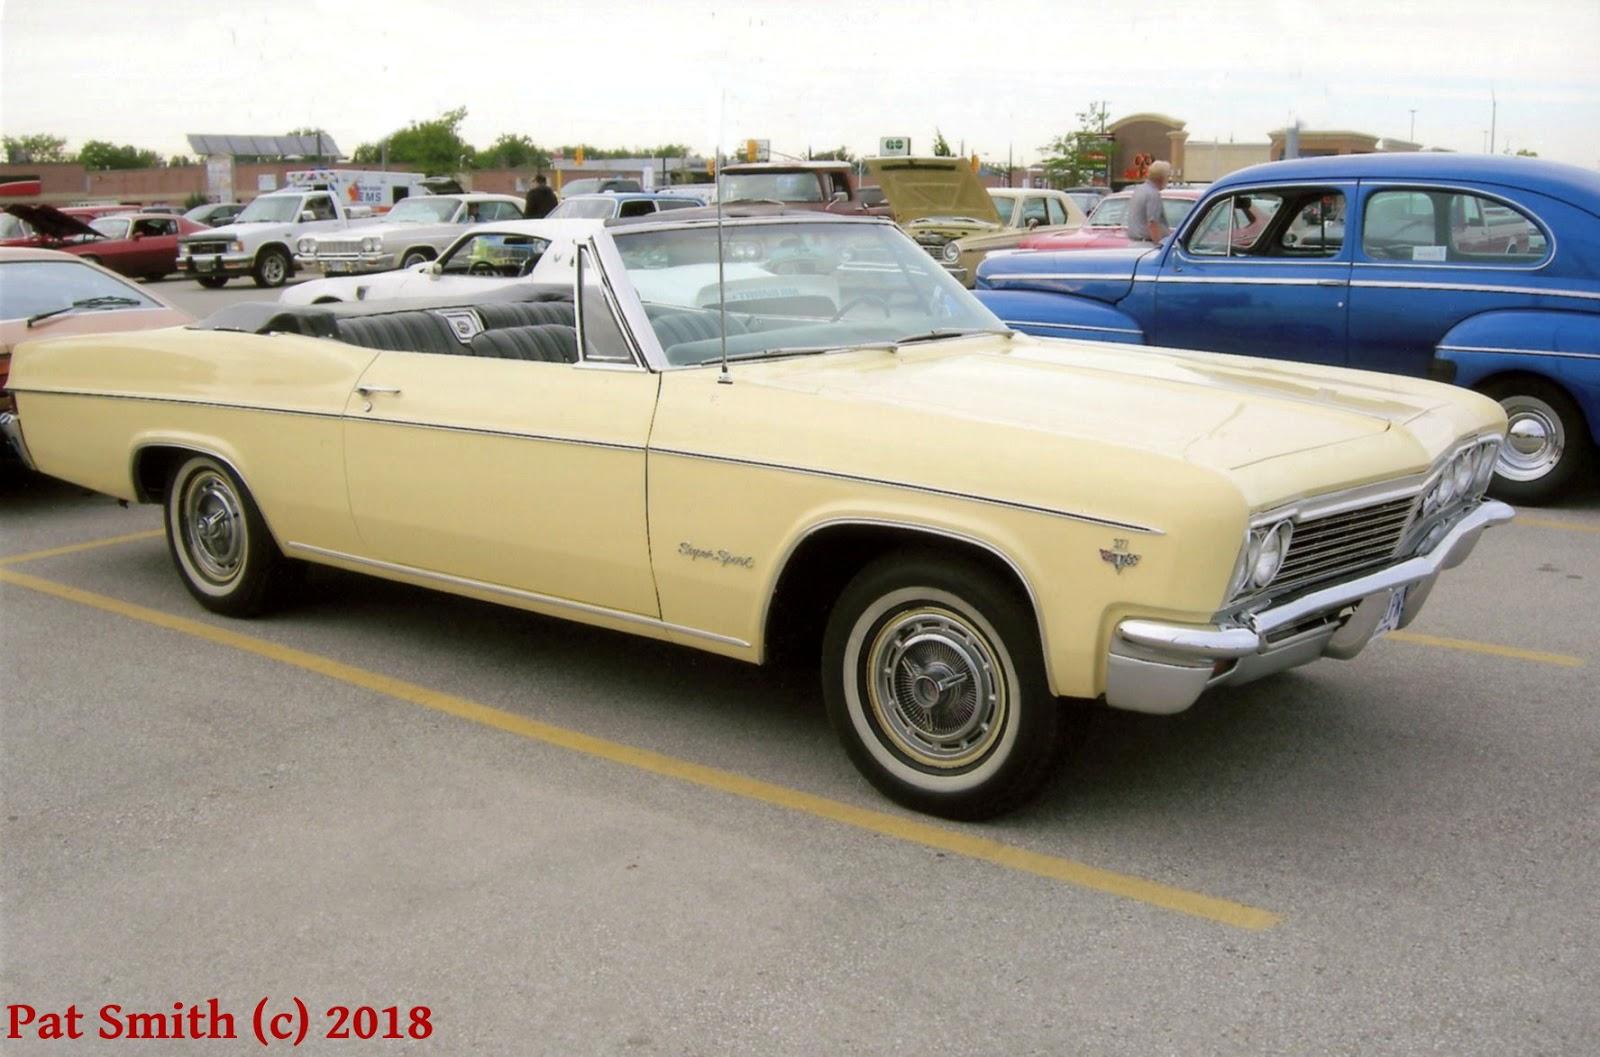 American Classic: 1966 Impala SS Convertible